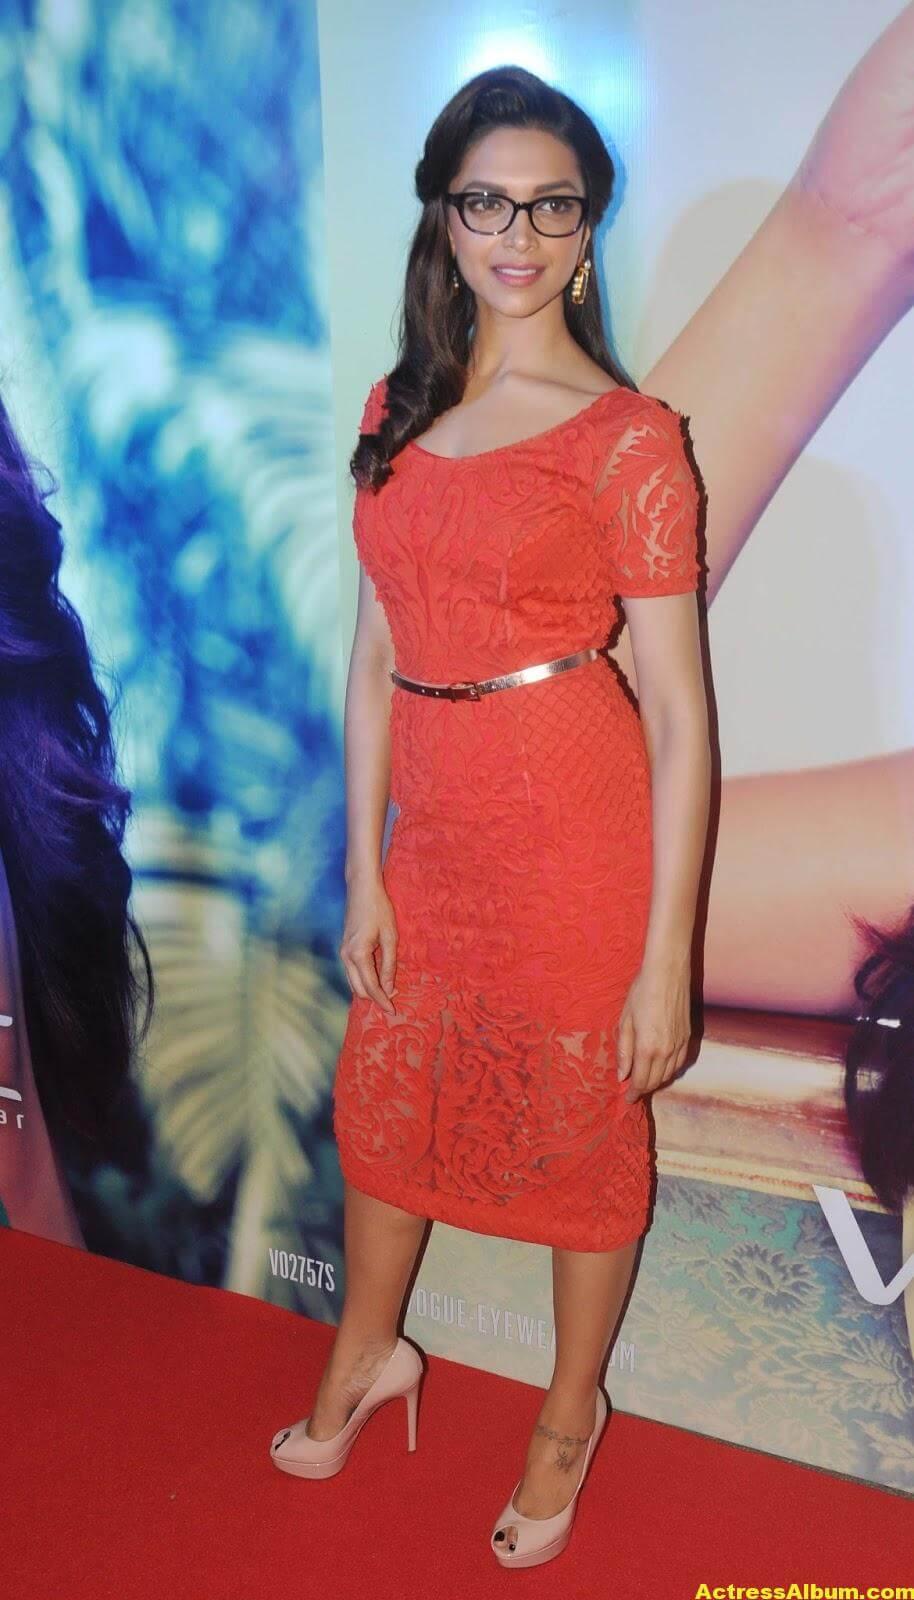 Deepika Padukone Photos In Orange Dress With Glass 3